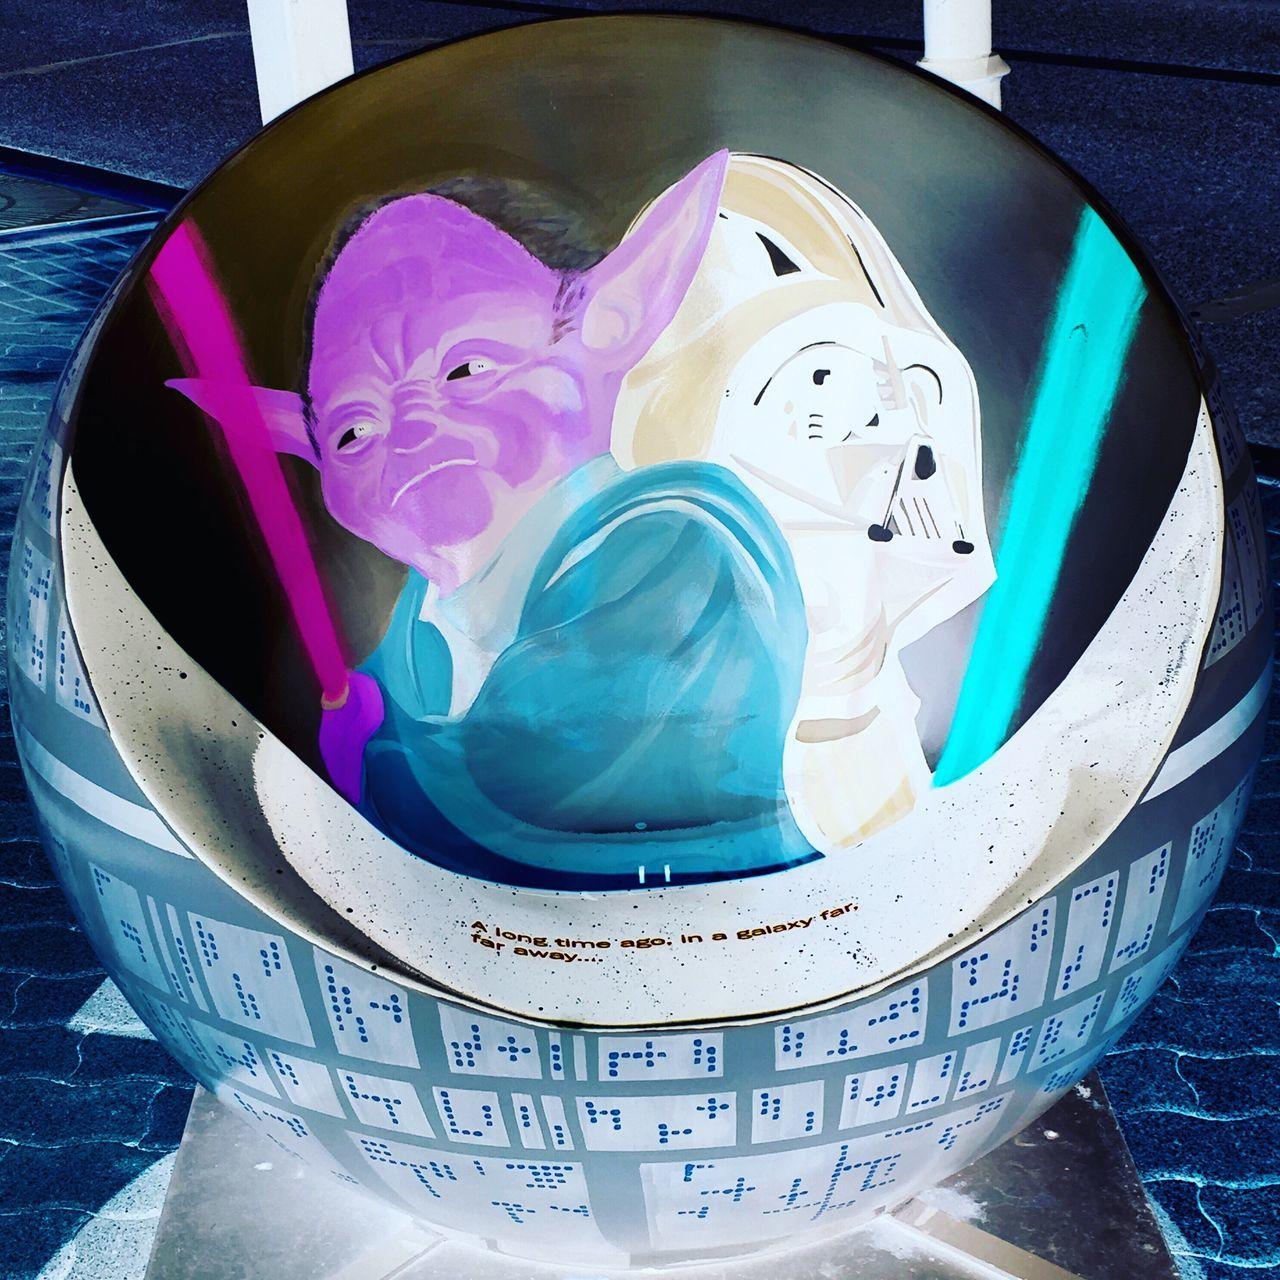 Yoda+DarthVader Starwars MayTheForceBeWithyou Artphotography